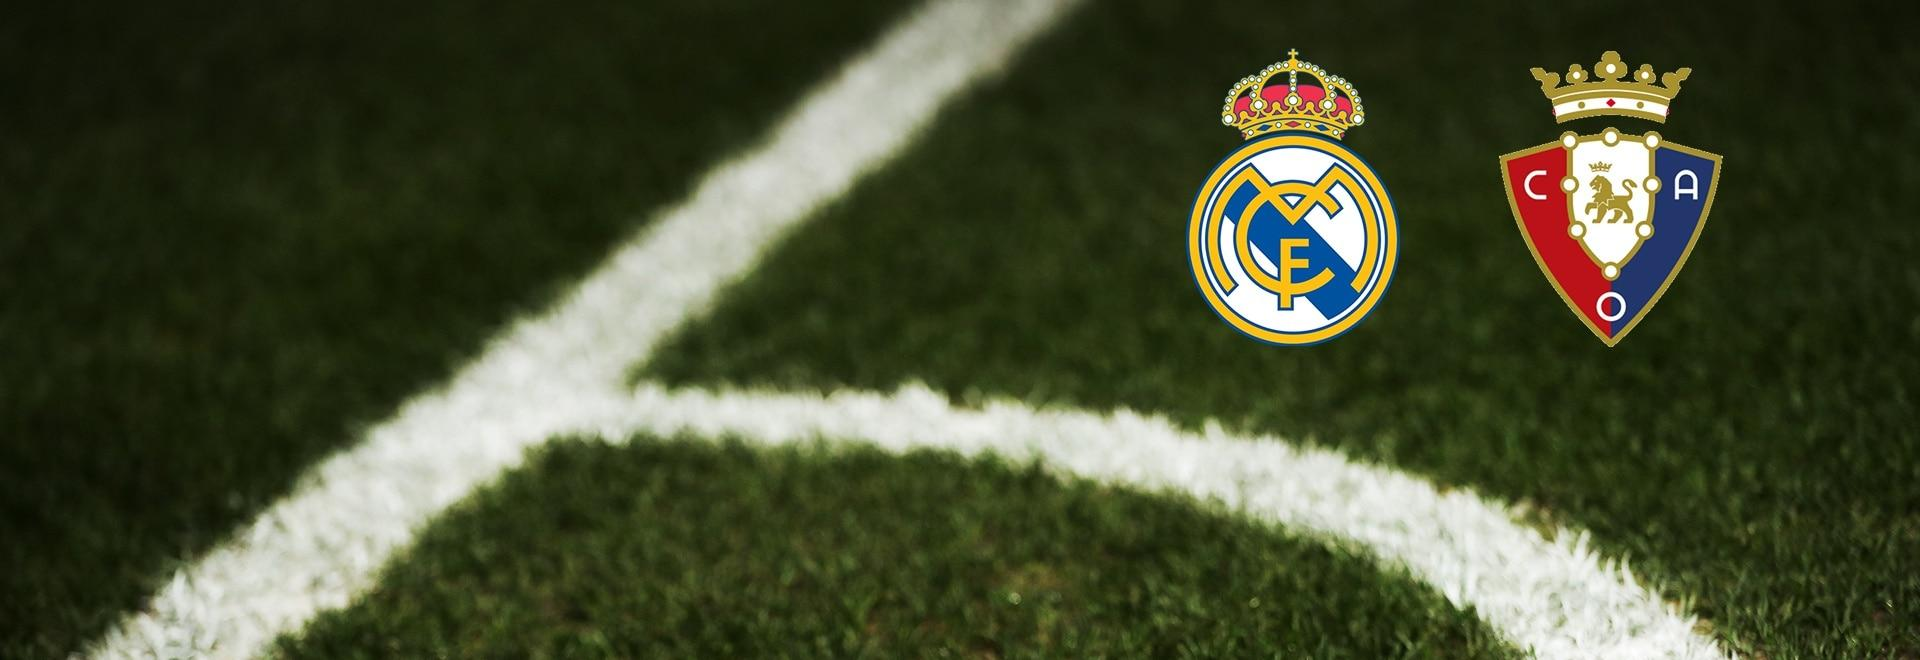 Real Madrid - Osasuna. 6a g.